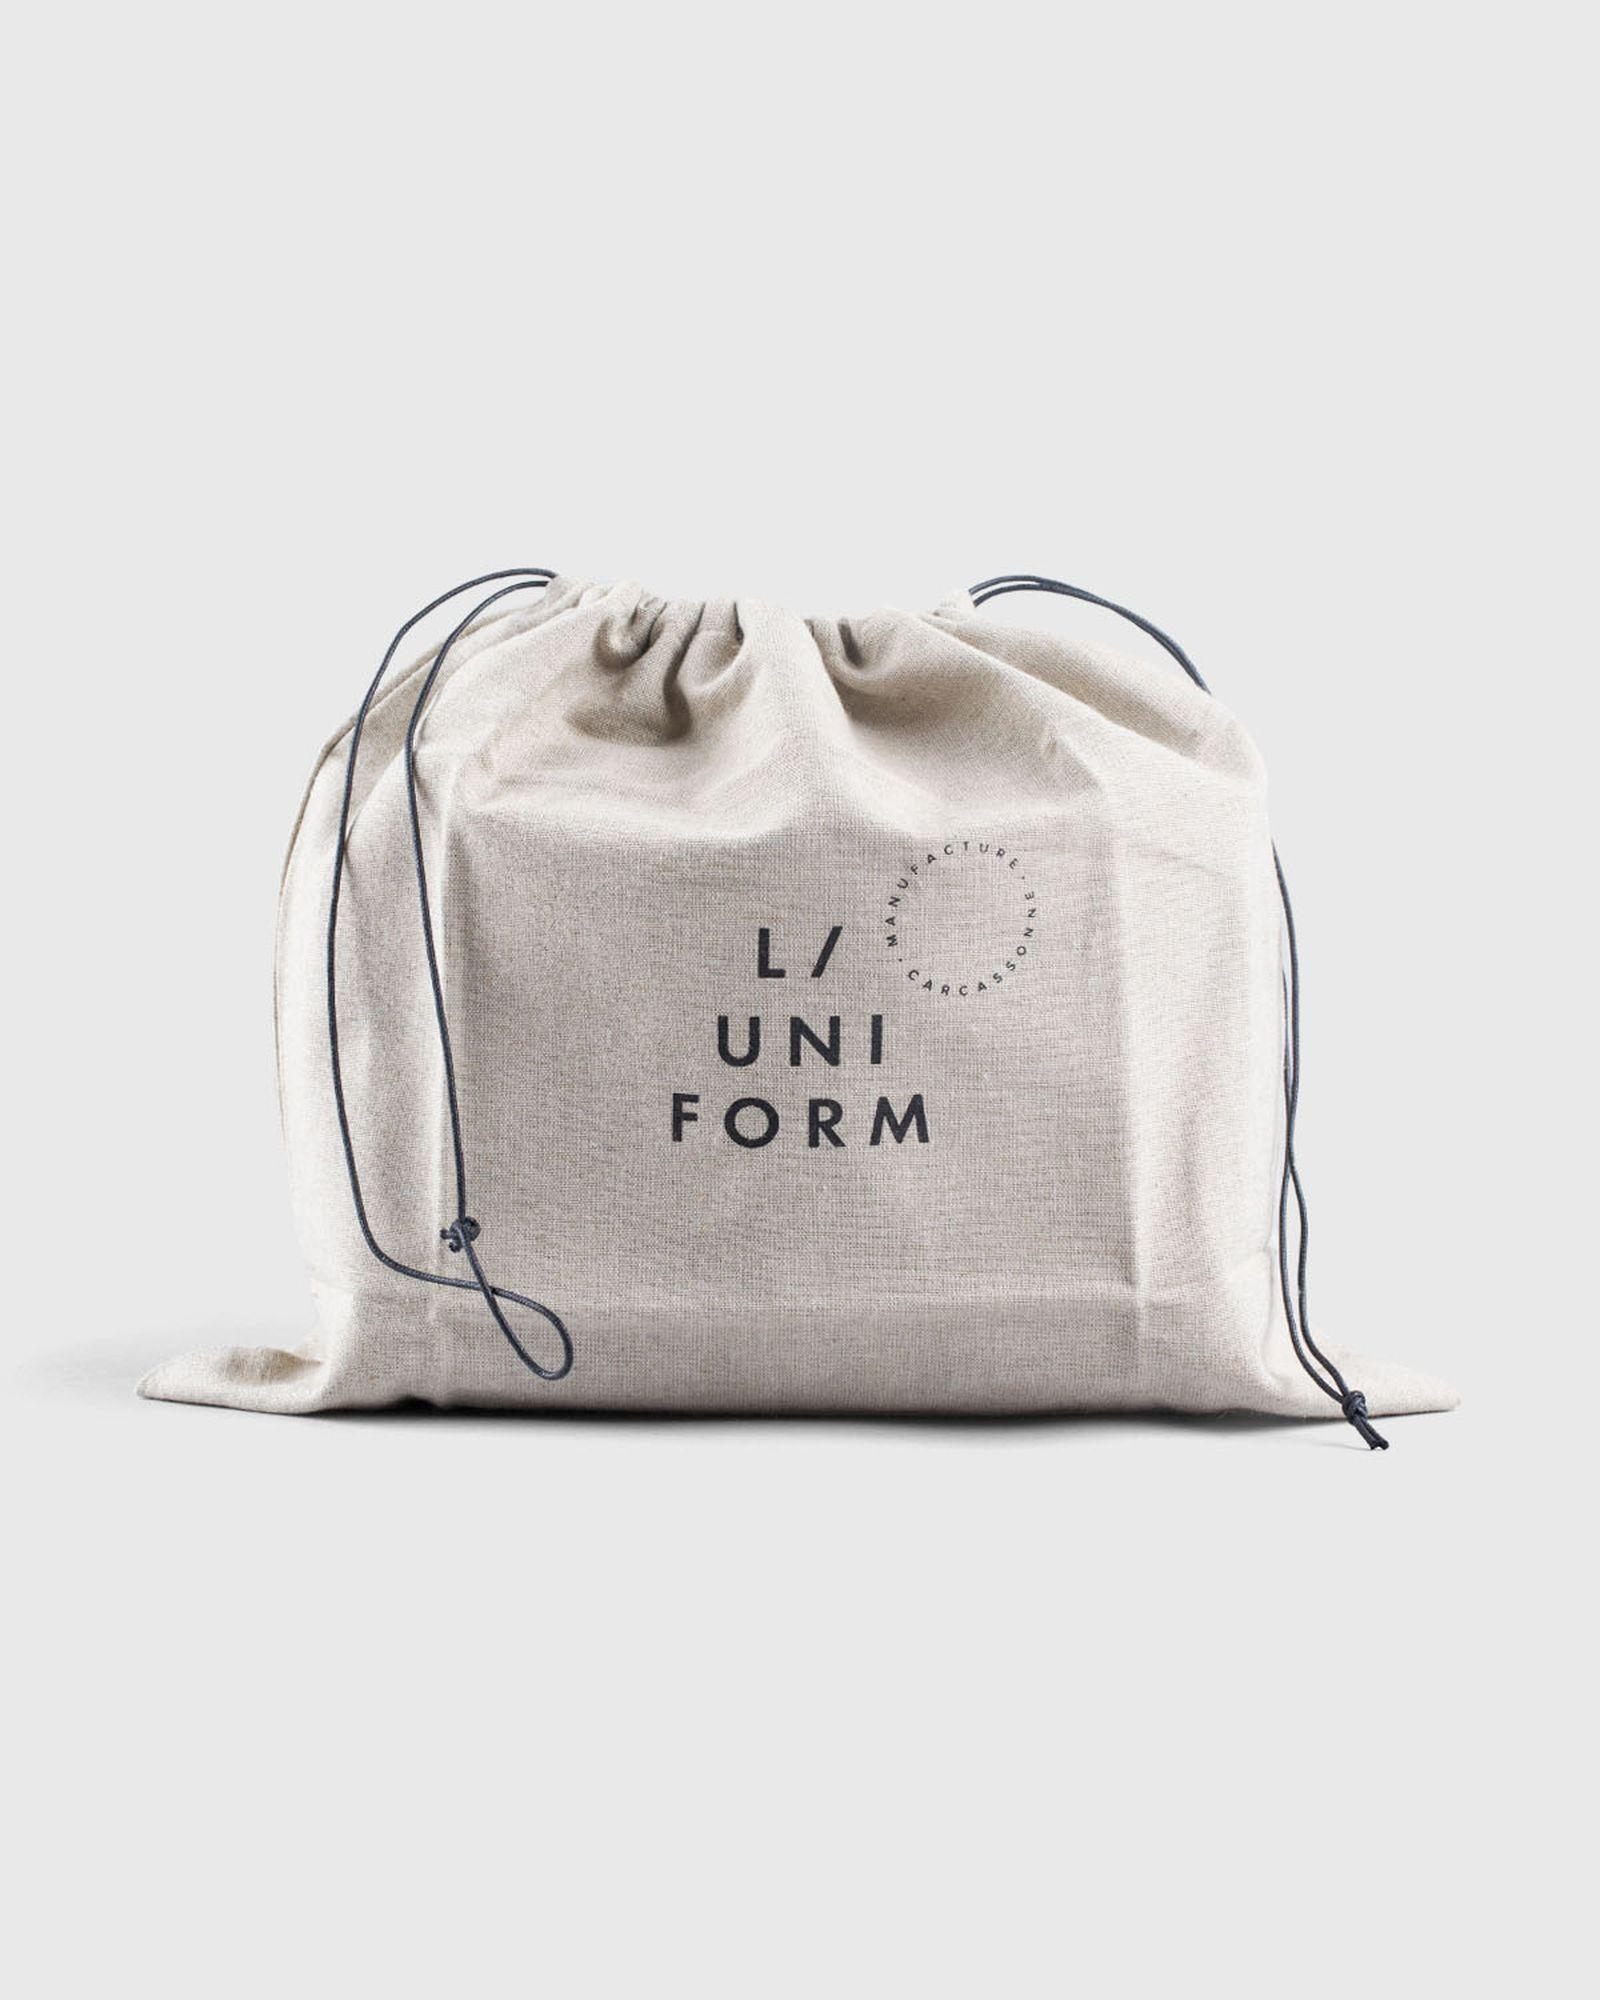 not-in-paris-releases-l-uniform-01